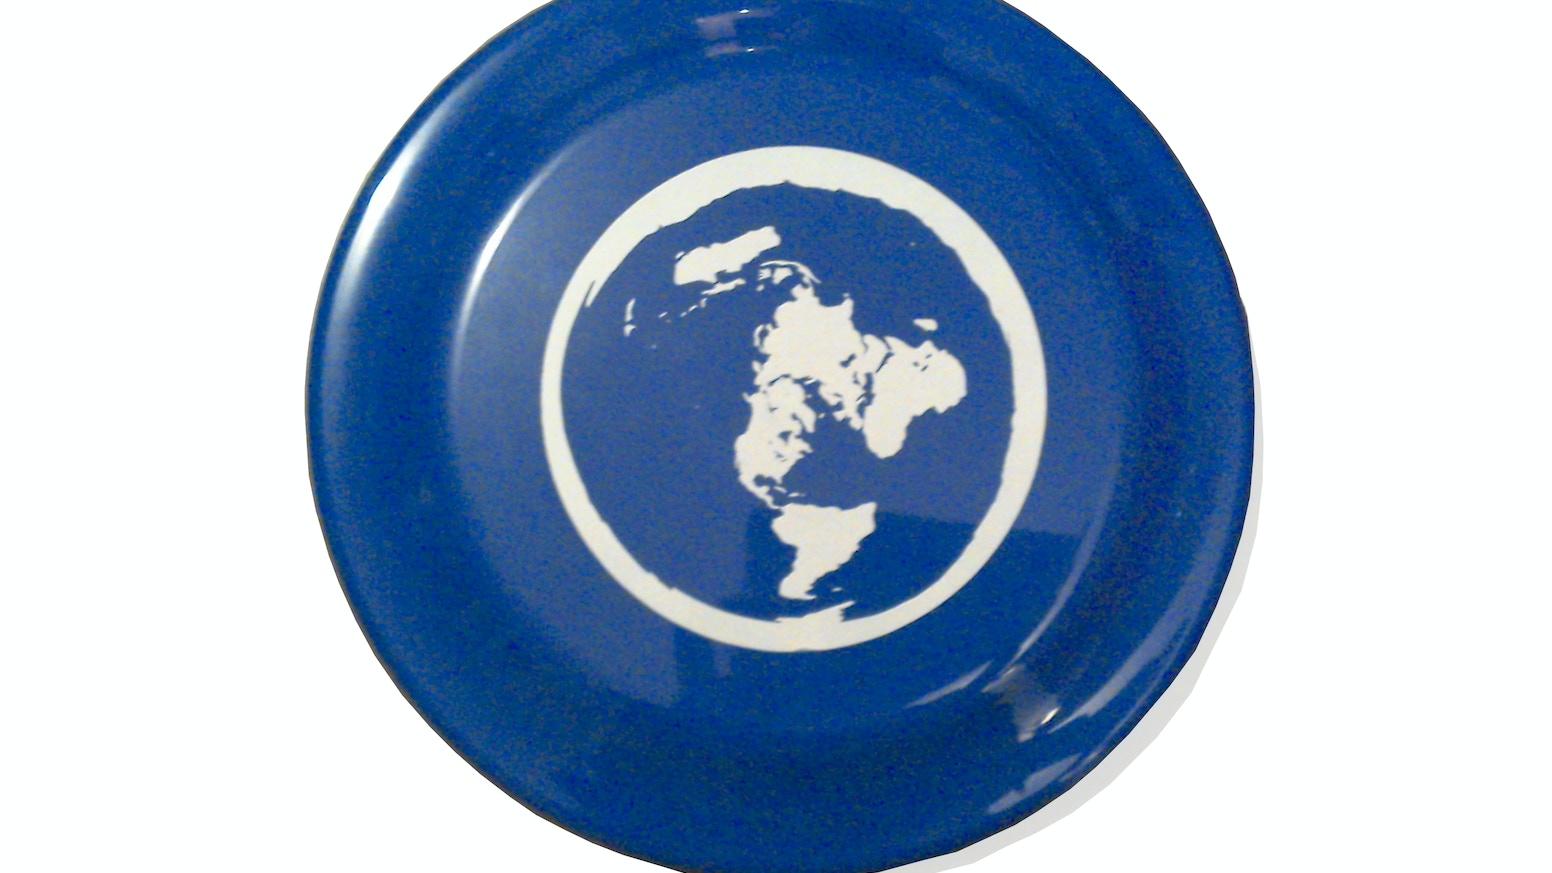 Flat Earth Map Ice Wall.Flat Earth Frisbee By John Rap Who Else Uses The Flat Earth